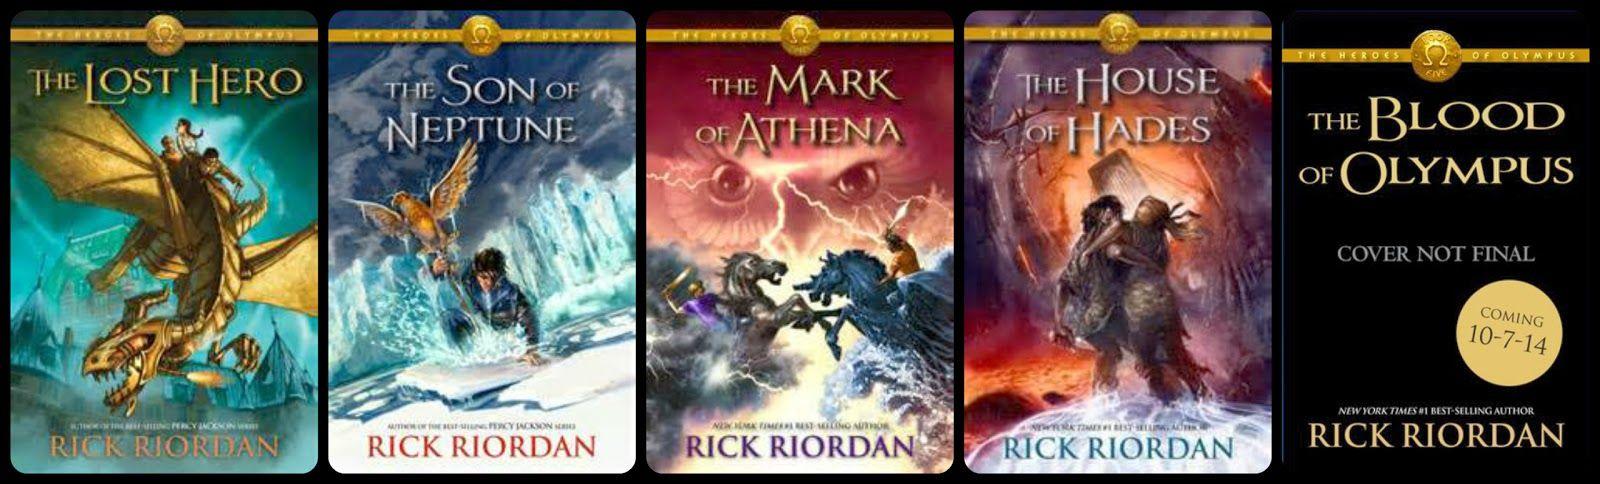 "Book Review: Rick Riordan's ""The Burning Maze"""